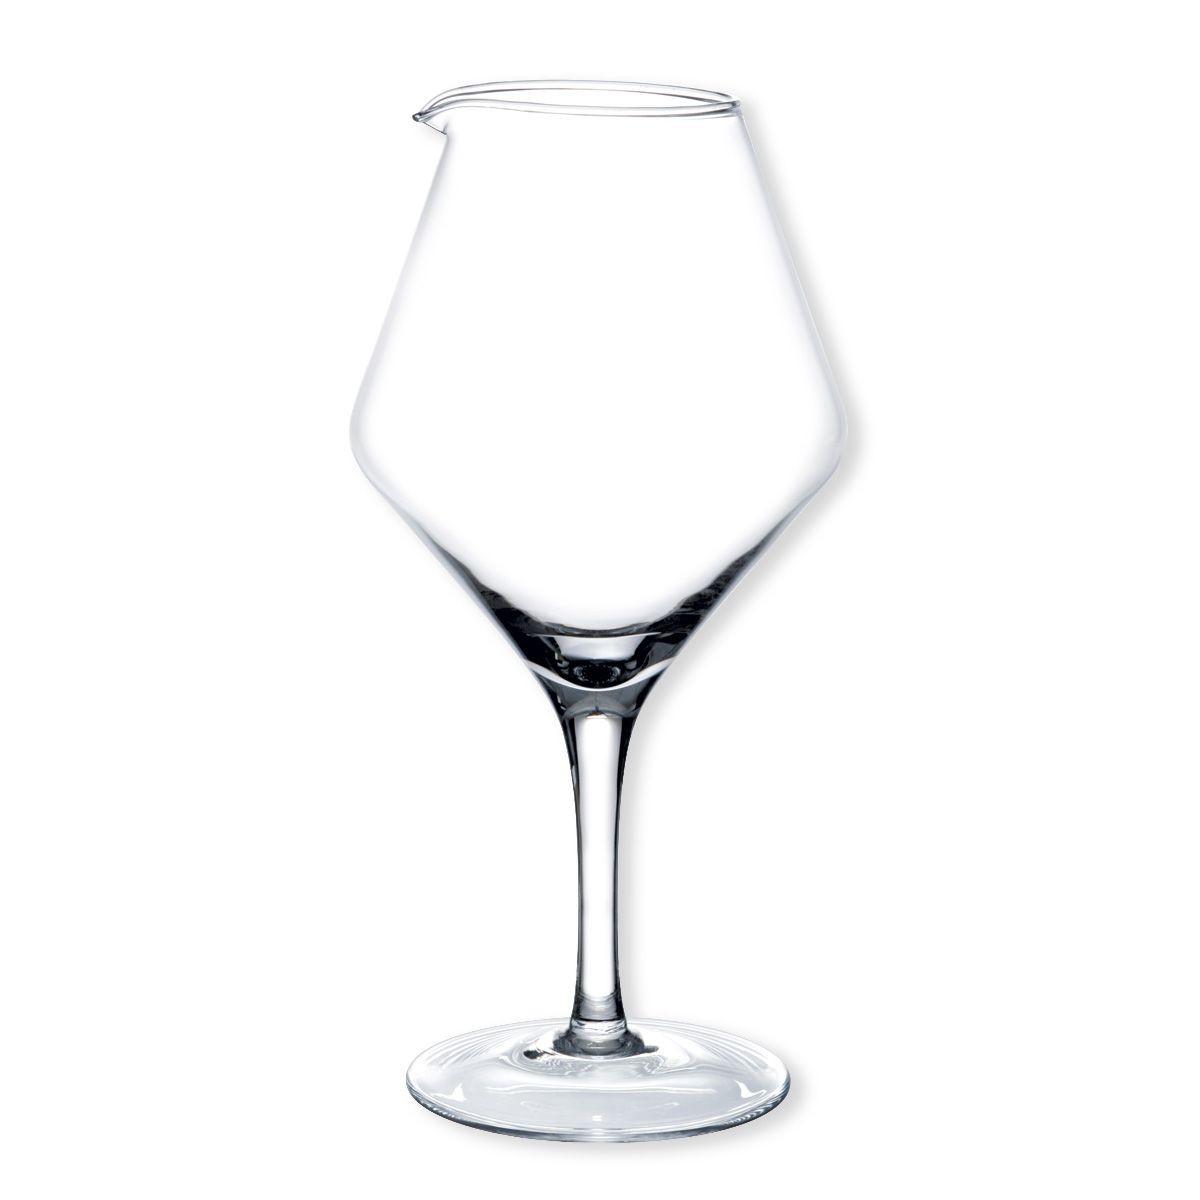 prestige d canteur en verre sur pied flutes coupes champagne verres pied verres. Black Bedroom Furniture Sets. Home Design Ideas